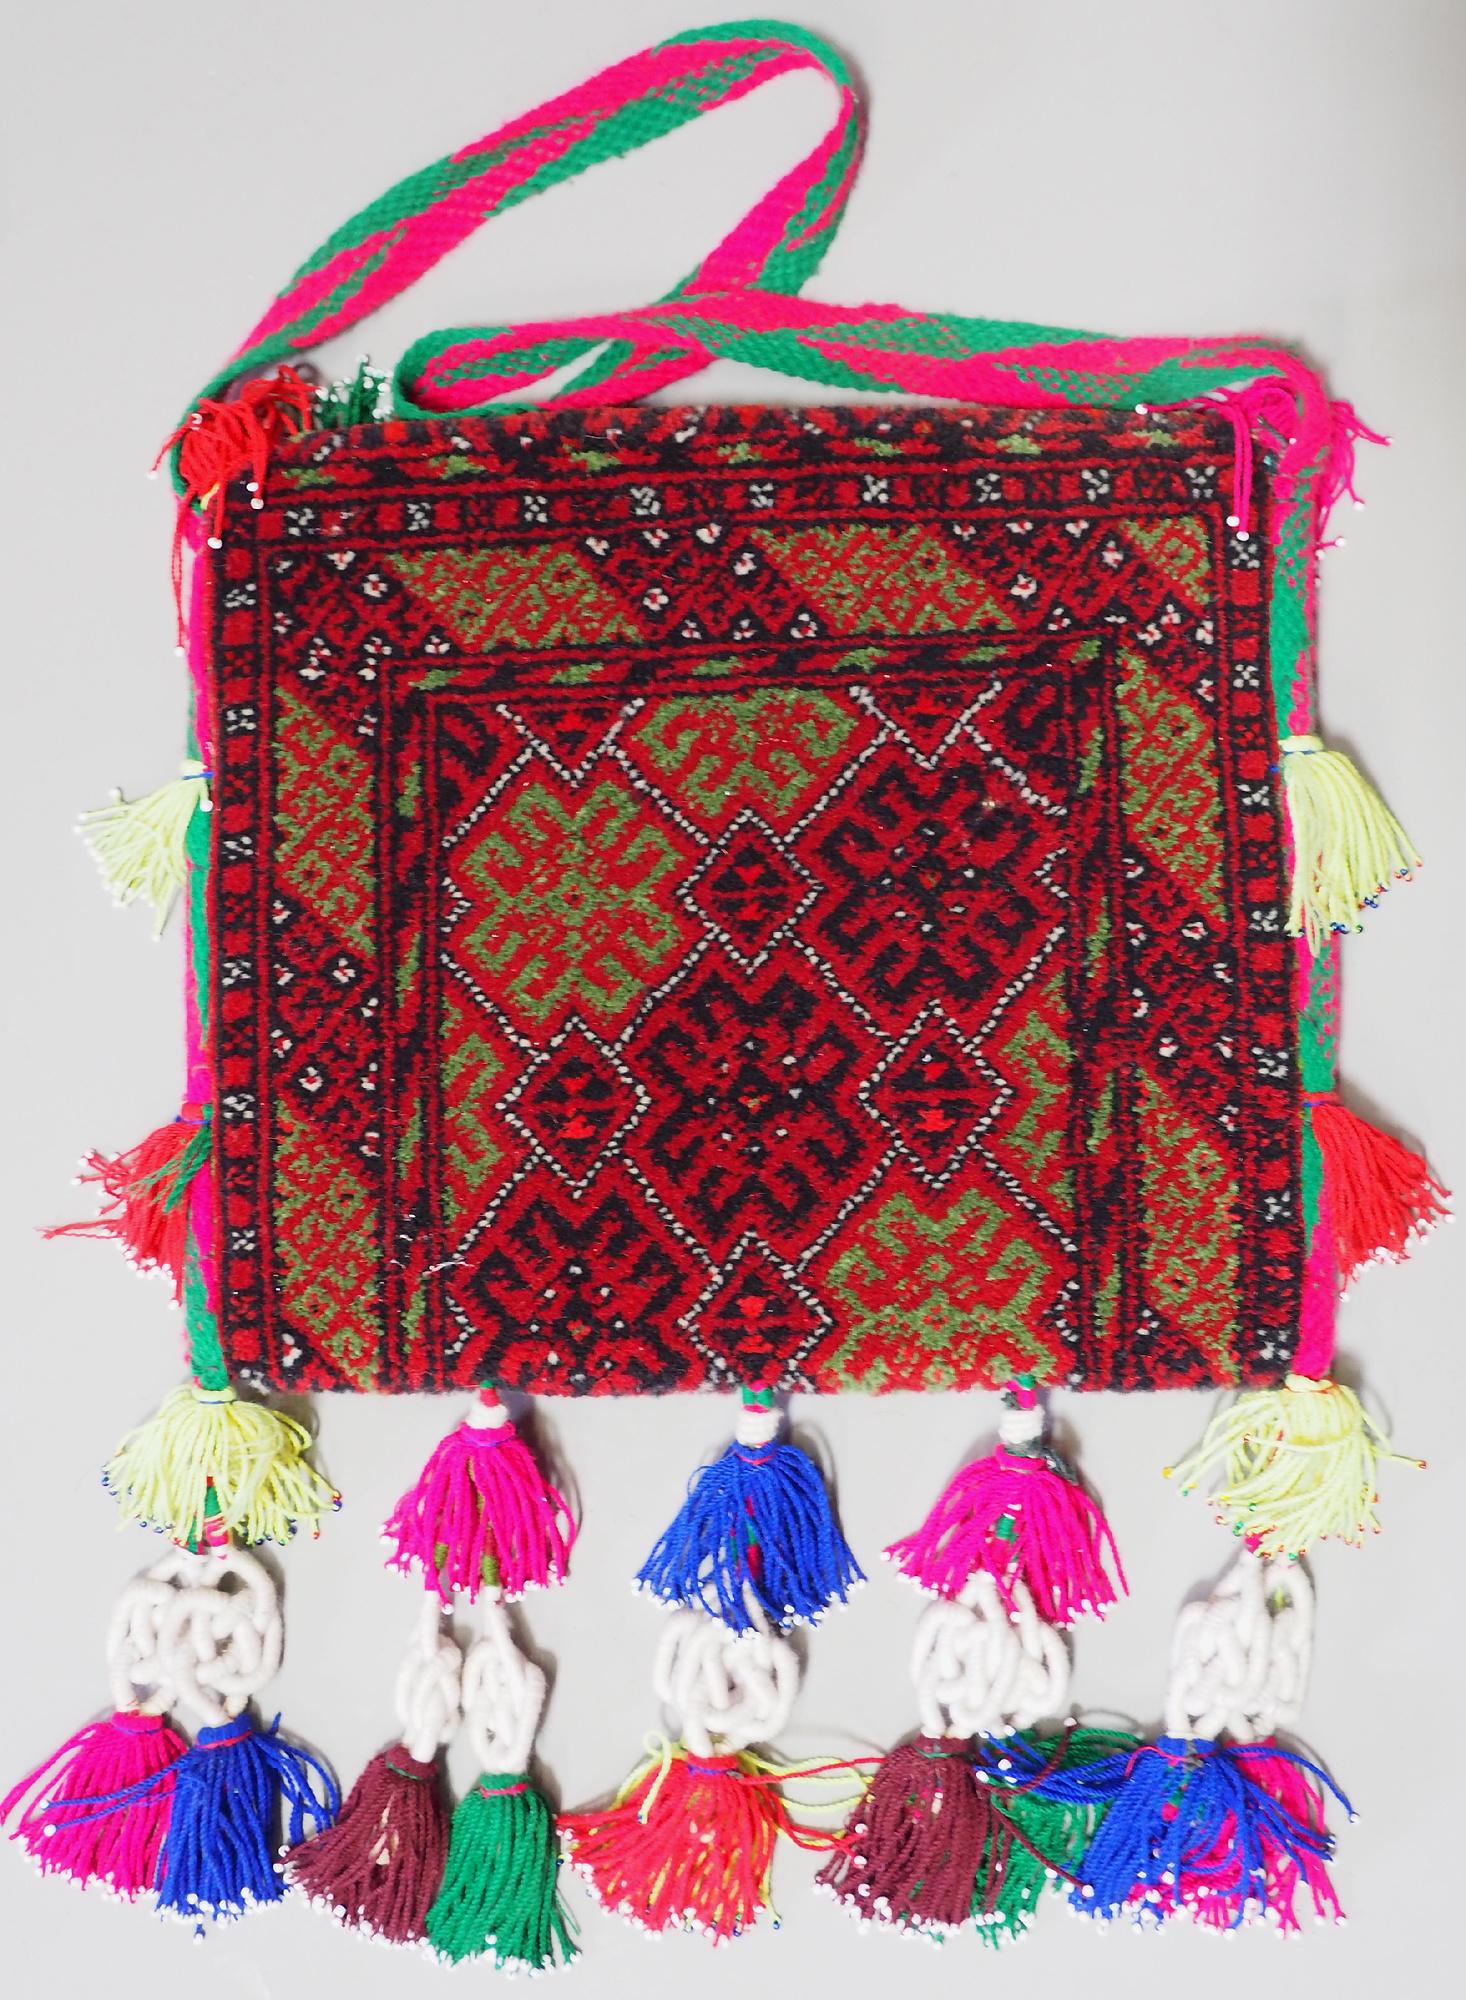 rare Hand knotted Turkmen wedding carpet Vintage Bag orient nomad rug ladies handbag Bohemian slingbag Afghanistan